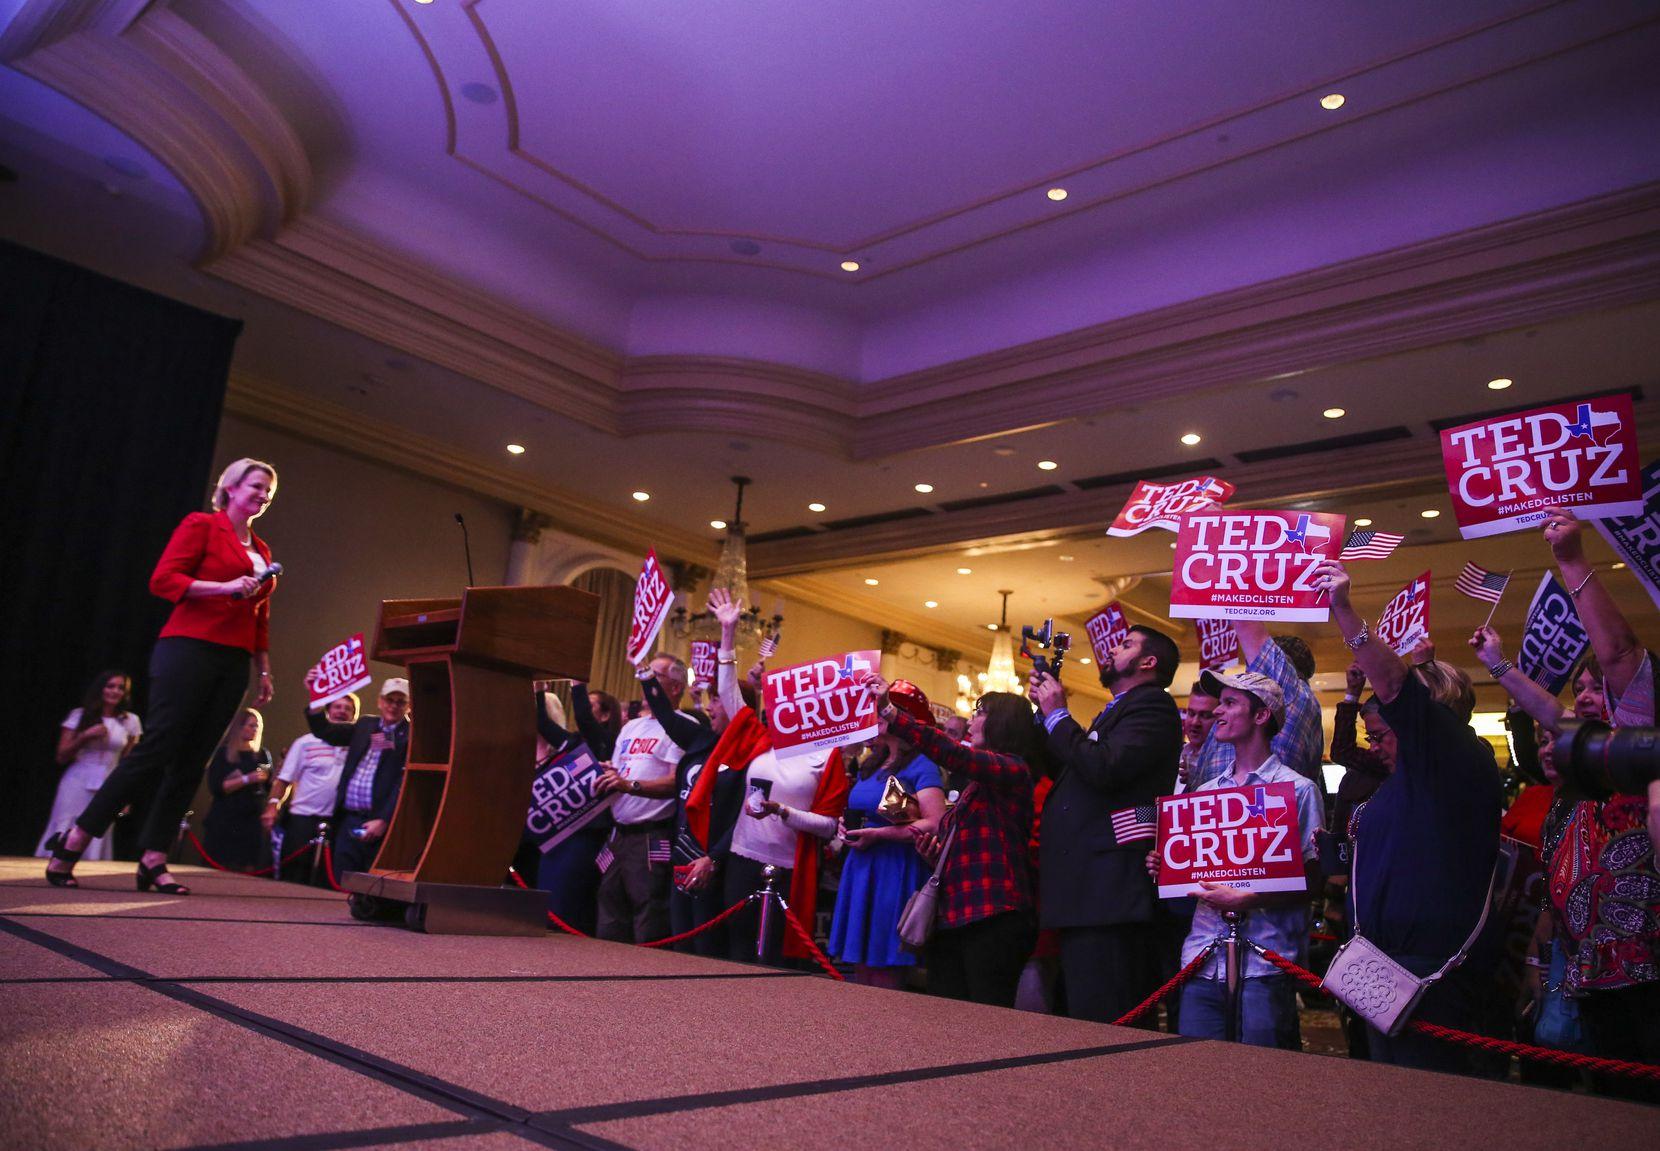 State Sen. Dawn Buckingham spoke during an election night party for Sen. Ted Cruz at the Hilton Post Oak in Houston. (2018 File Photo/Ryan Michalesko)